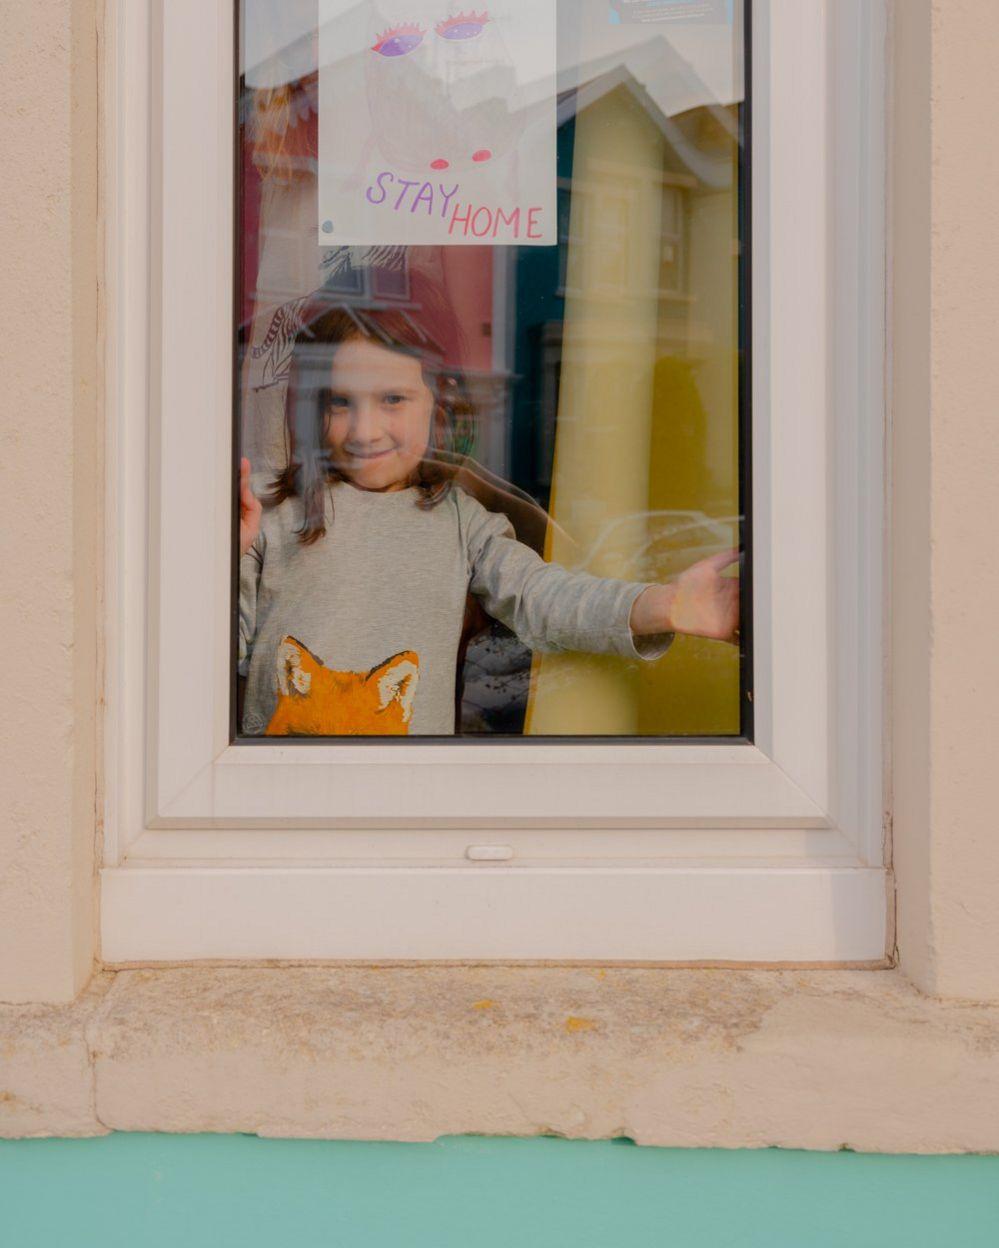 Freida at the window